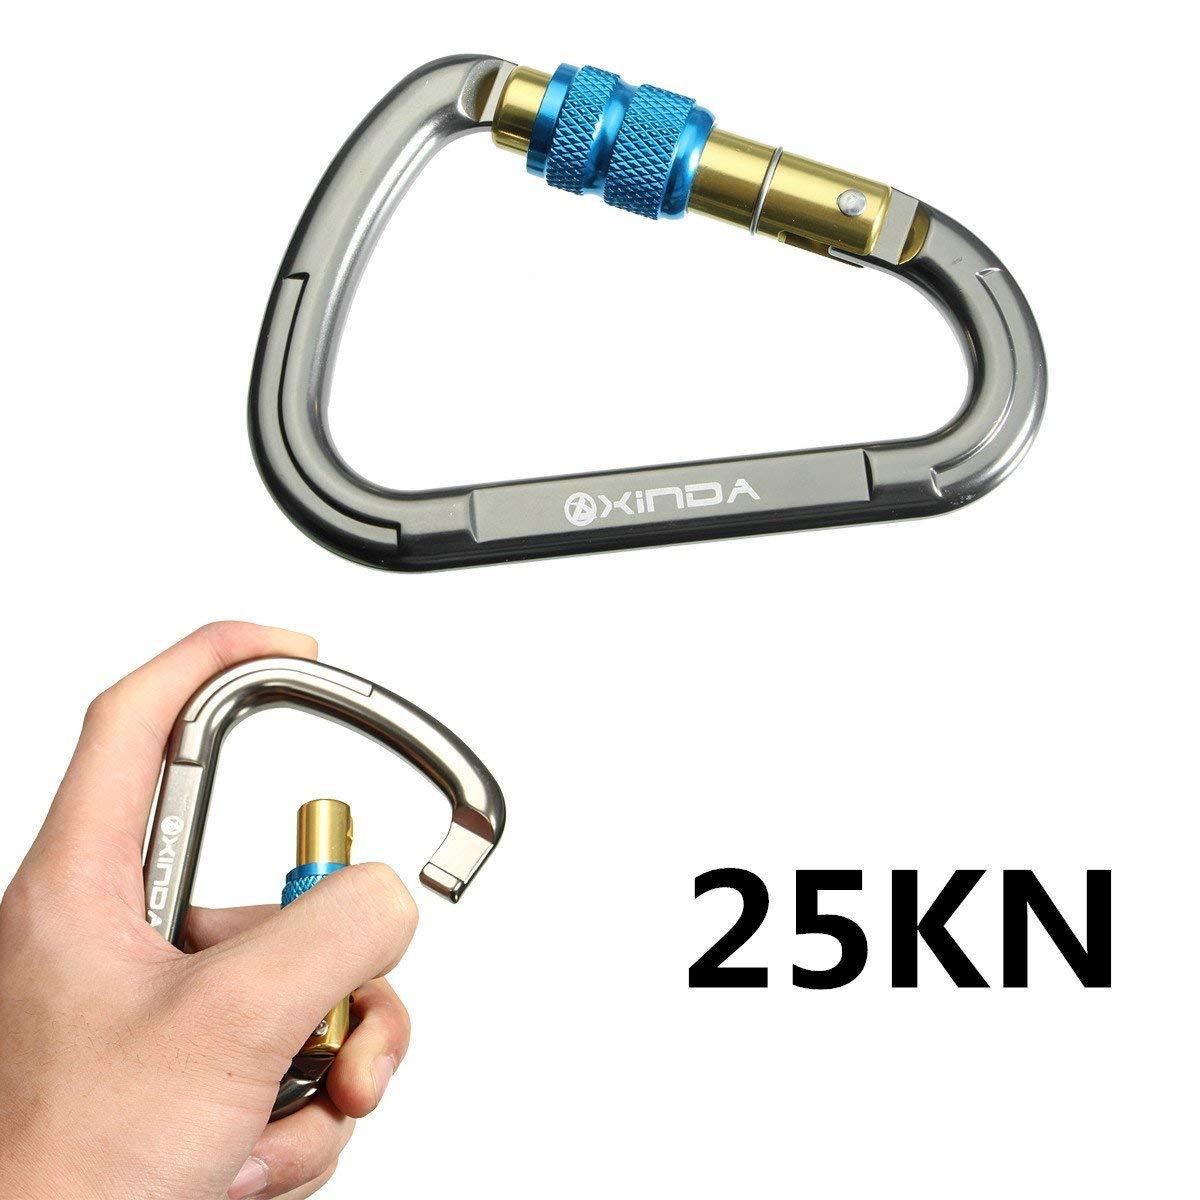 D-ring 26KN Screw Locking Carabiner Climbing Caving Hook Keychain Aluminum US